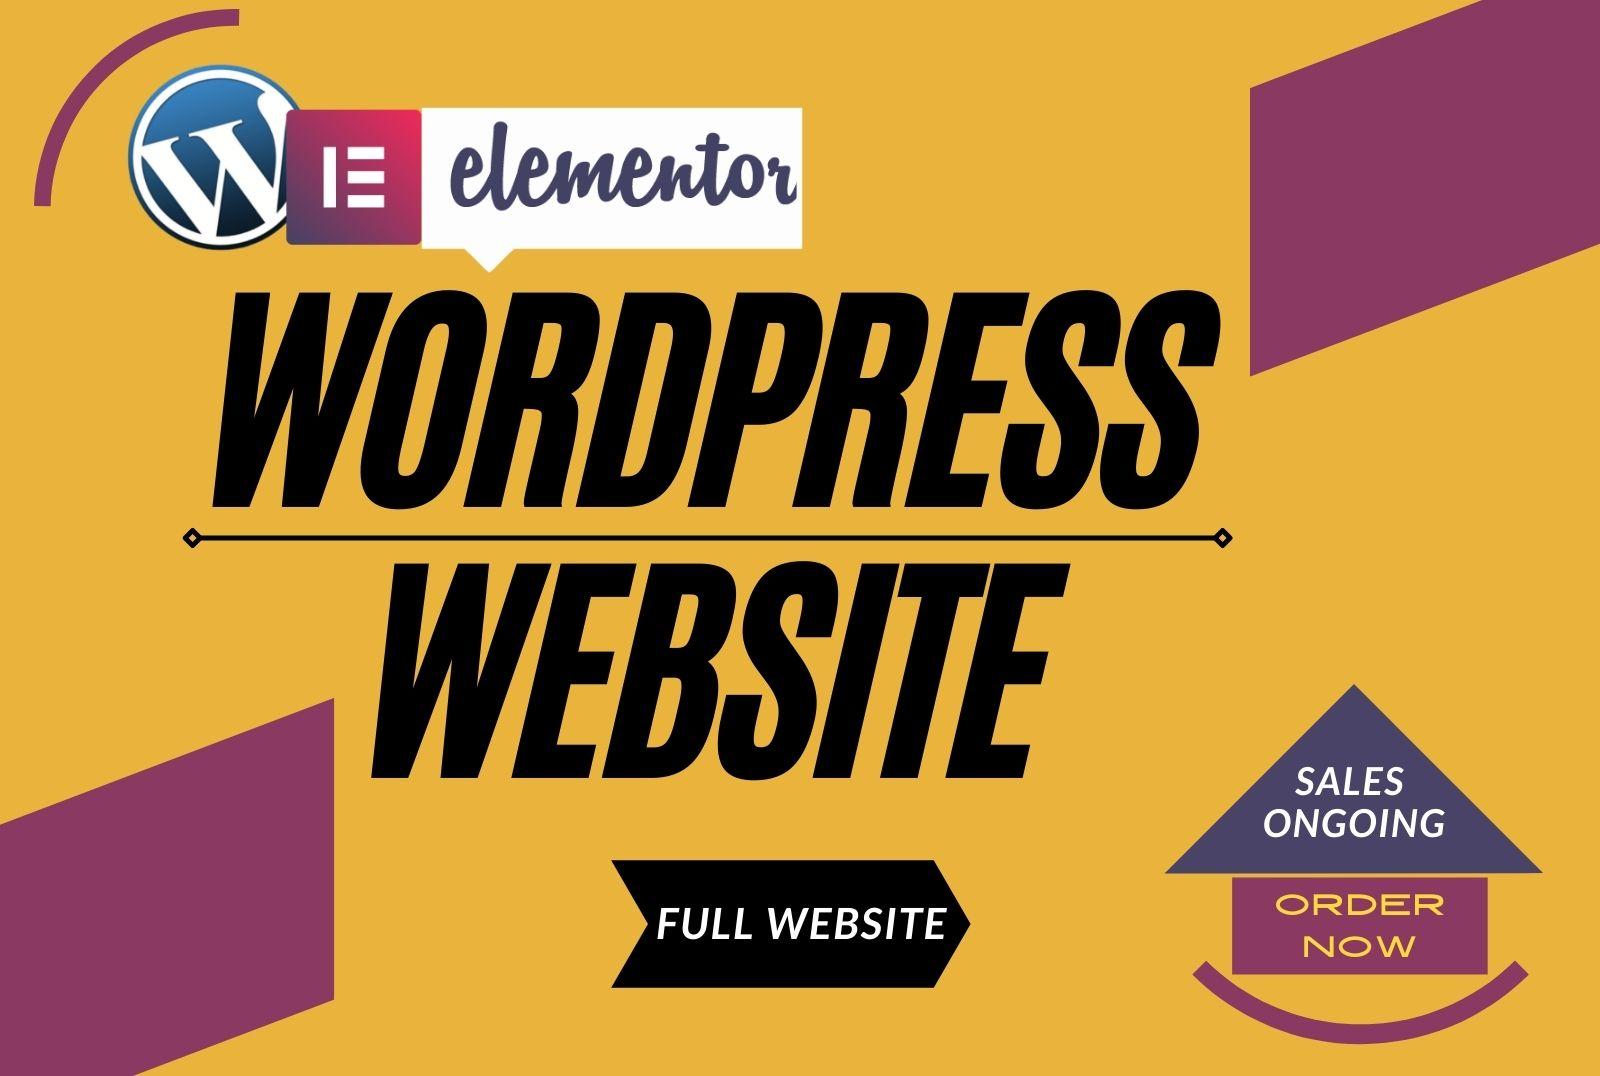 I will customize wordpress website responsive design with elementor pro